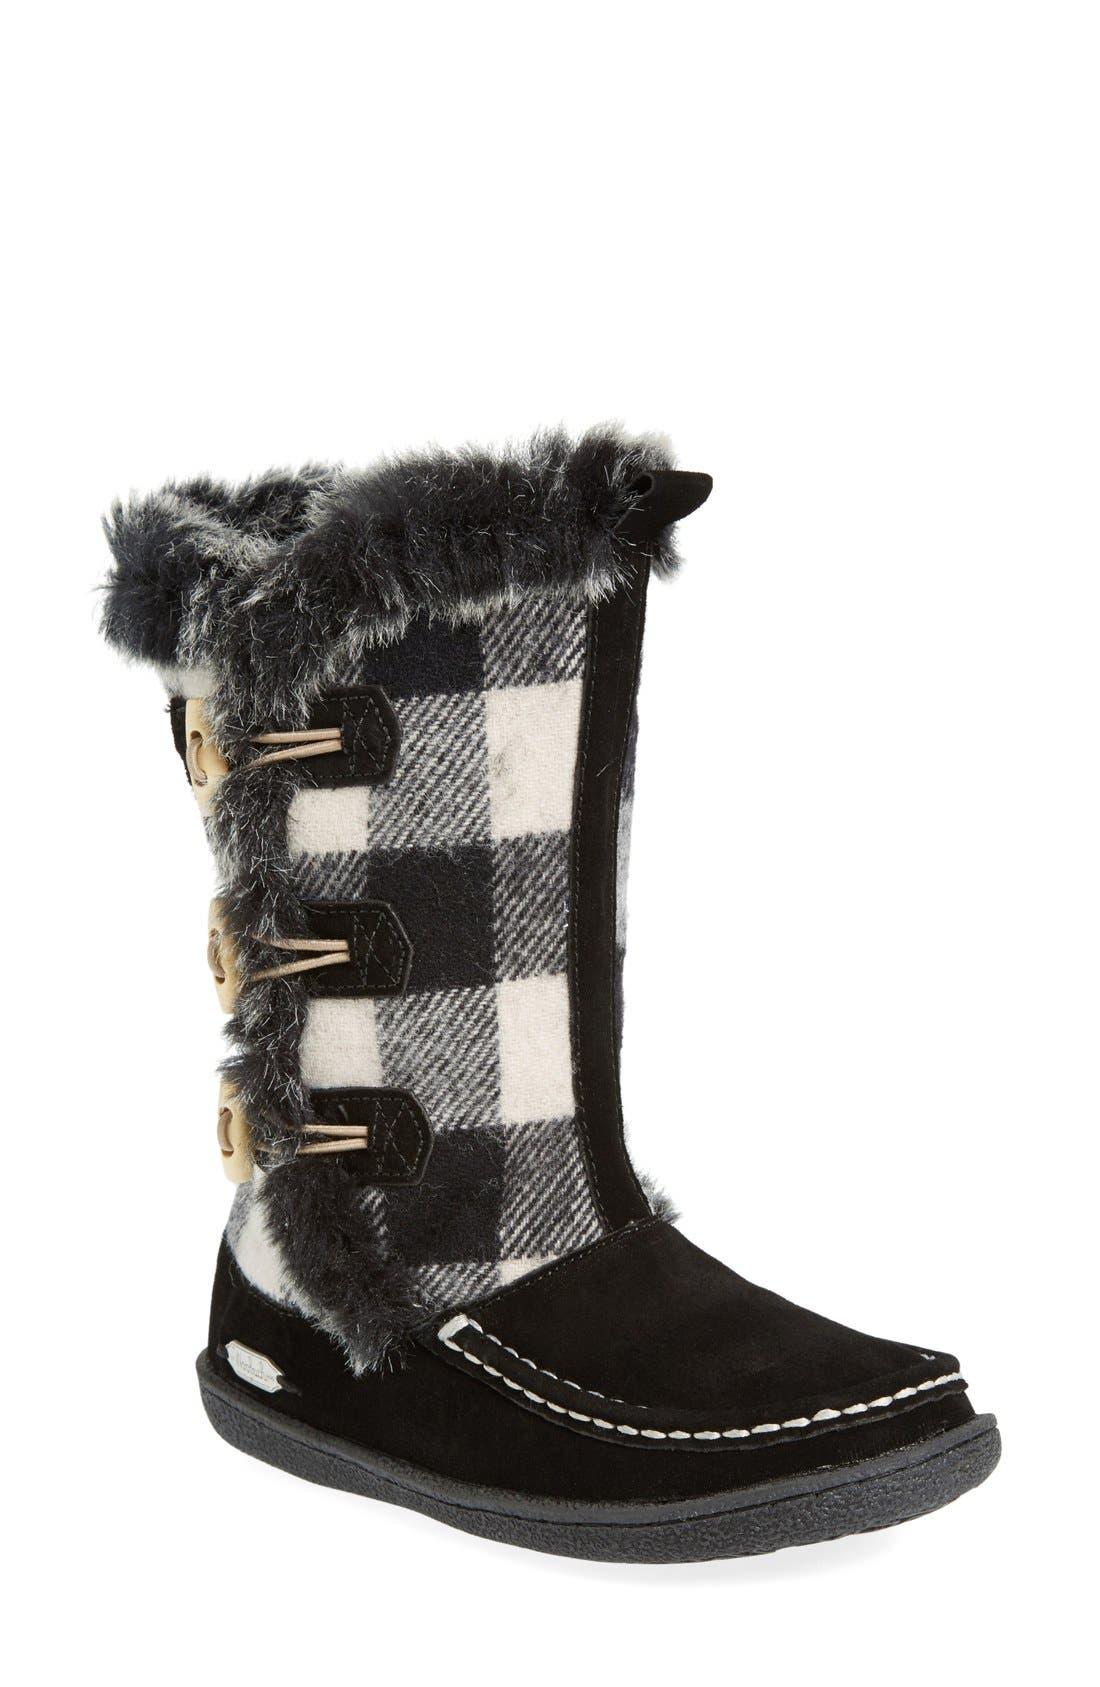 'Elk Creek' Boot,                         Main,                         color, Black/ Buffalo Wool